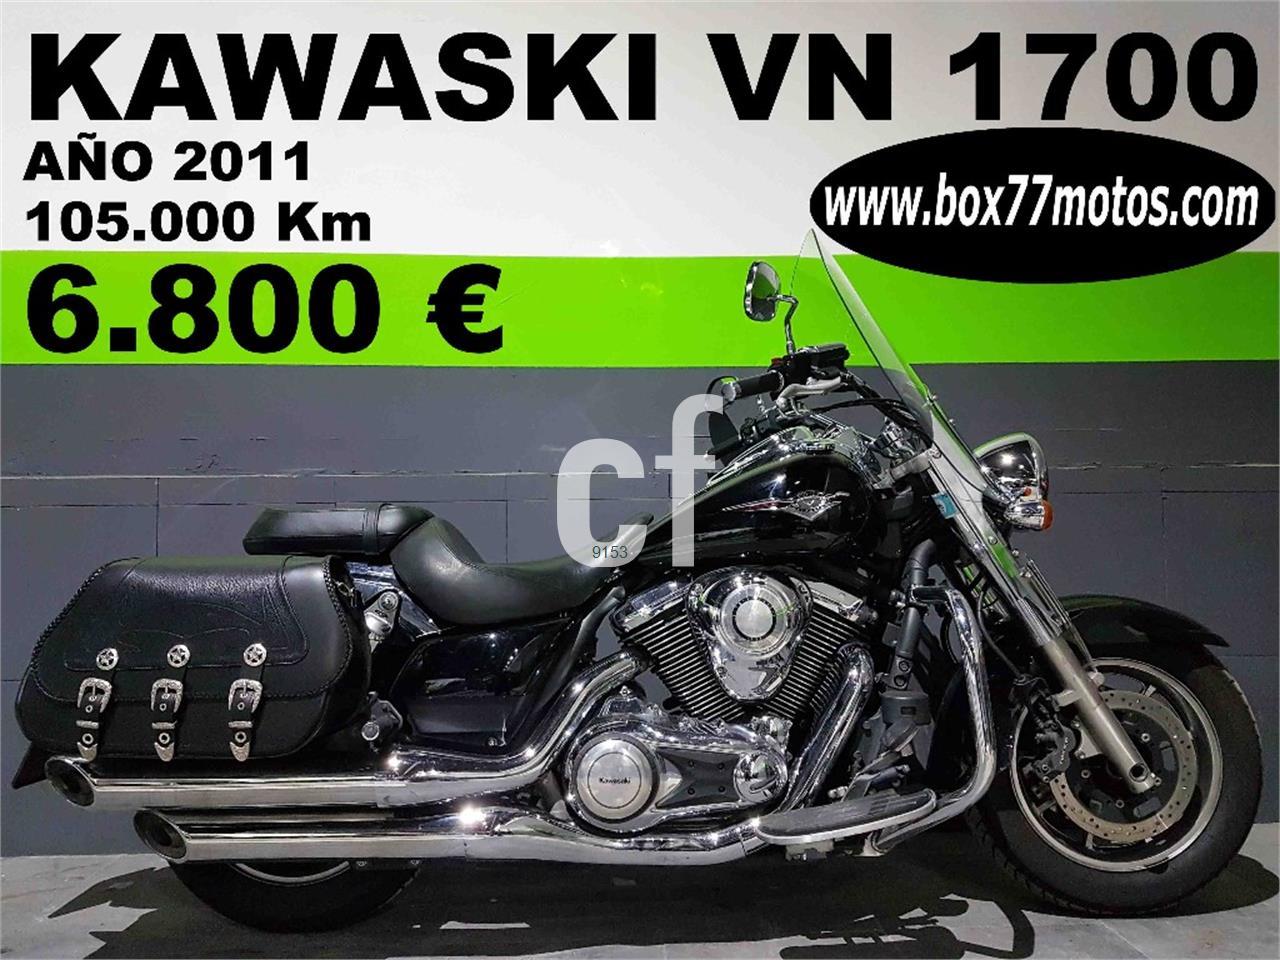 KAWASAKI VN 1700 Classic de venta